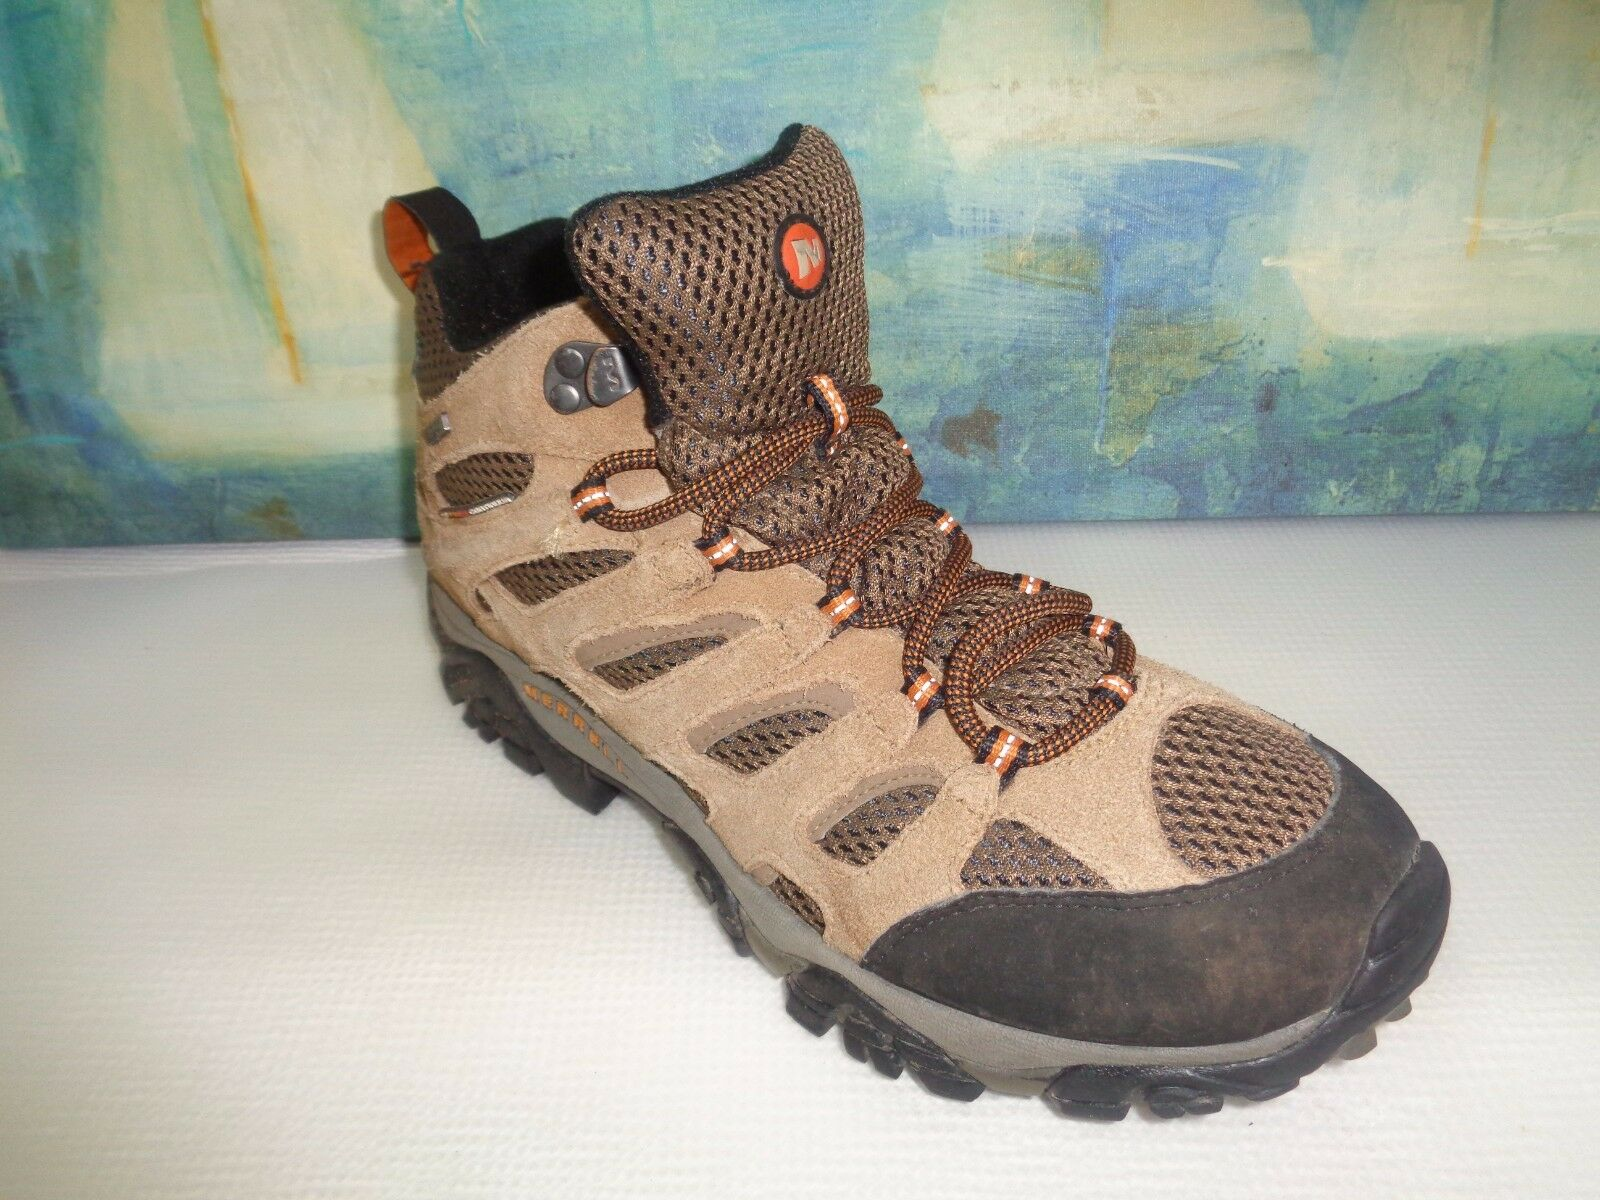 Homme Merrell J88623 Moab Mid Imperméable Randonnée Chaussure Earth marron Taille 10